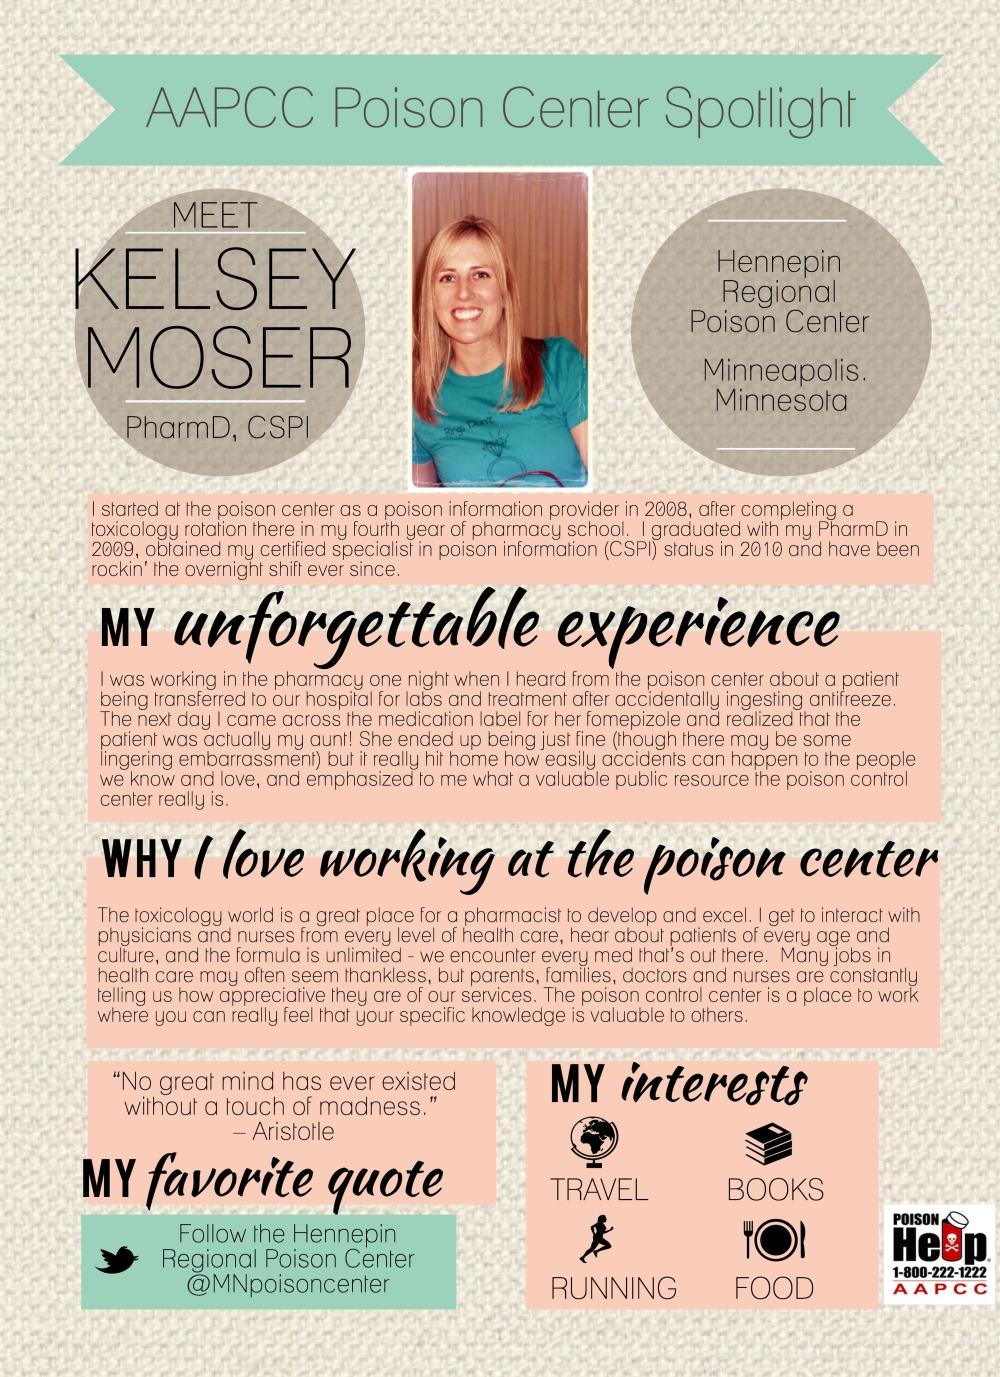 KelseyMoserSpotlight